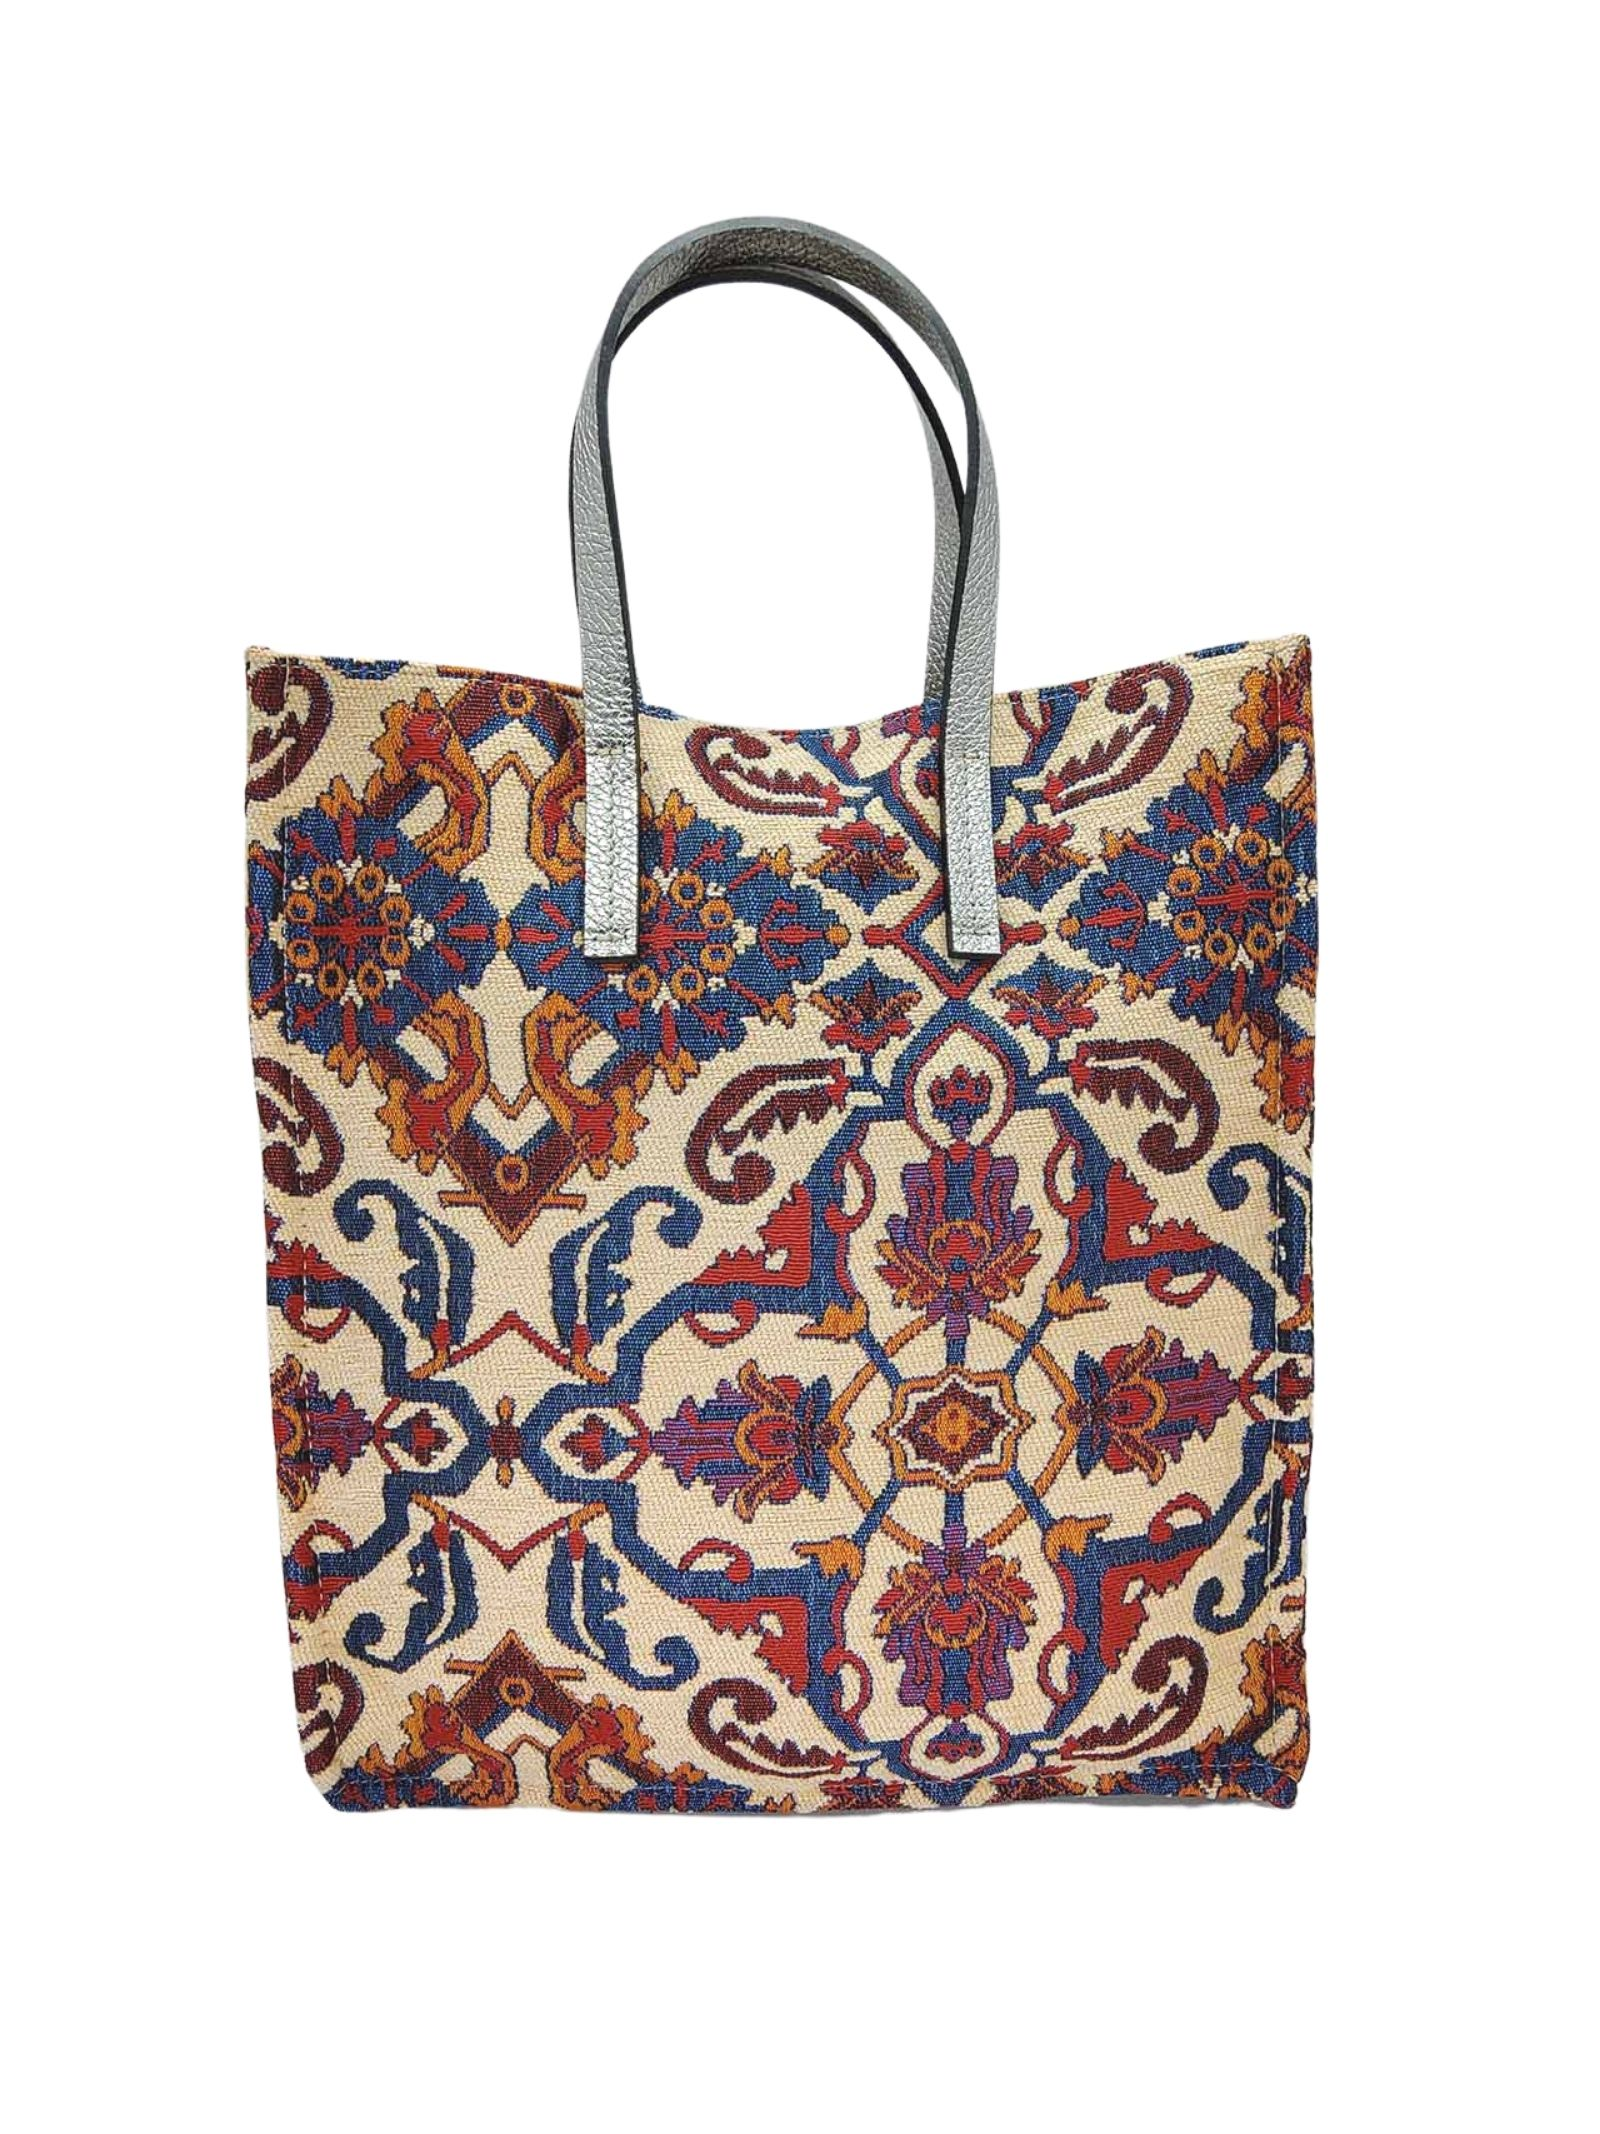 Borse Donna Shopping in Tessuto Panna Fantasia Jacquard con Doppio Manico Kassiopea   Borse e zaini   UMIL016